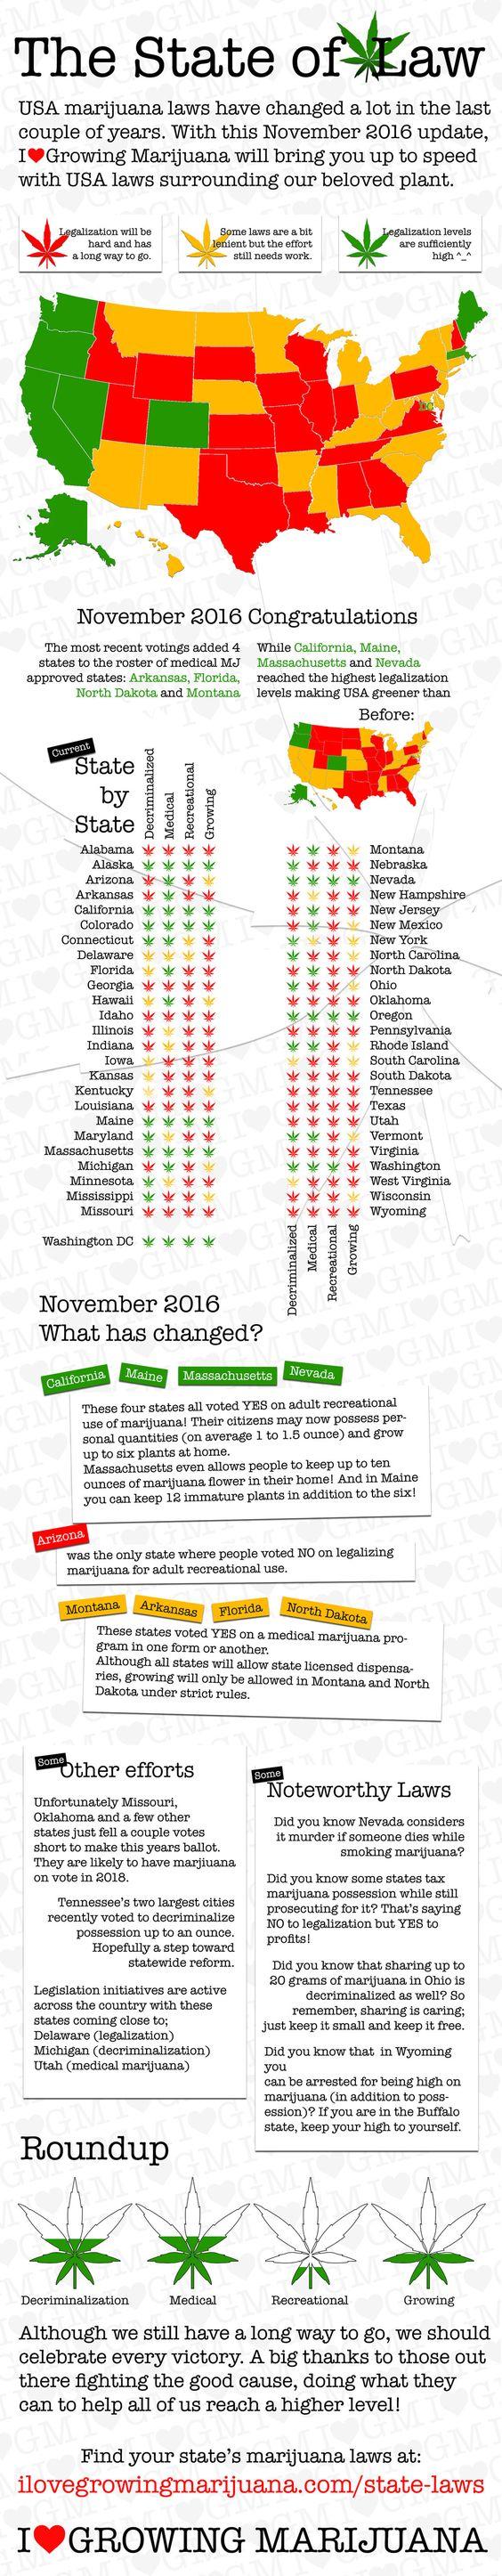 The State of Marijuana Laws uCollect. My state of Nevada passed recreational marijuana. Infographics